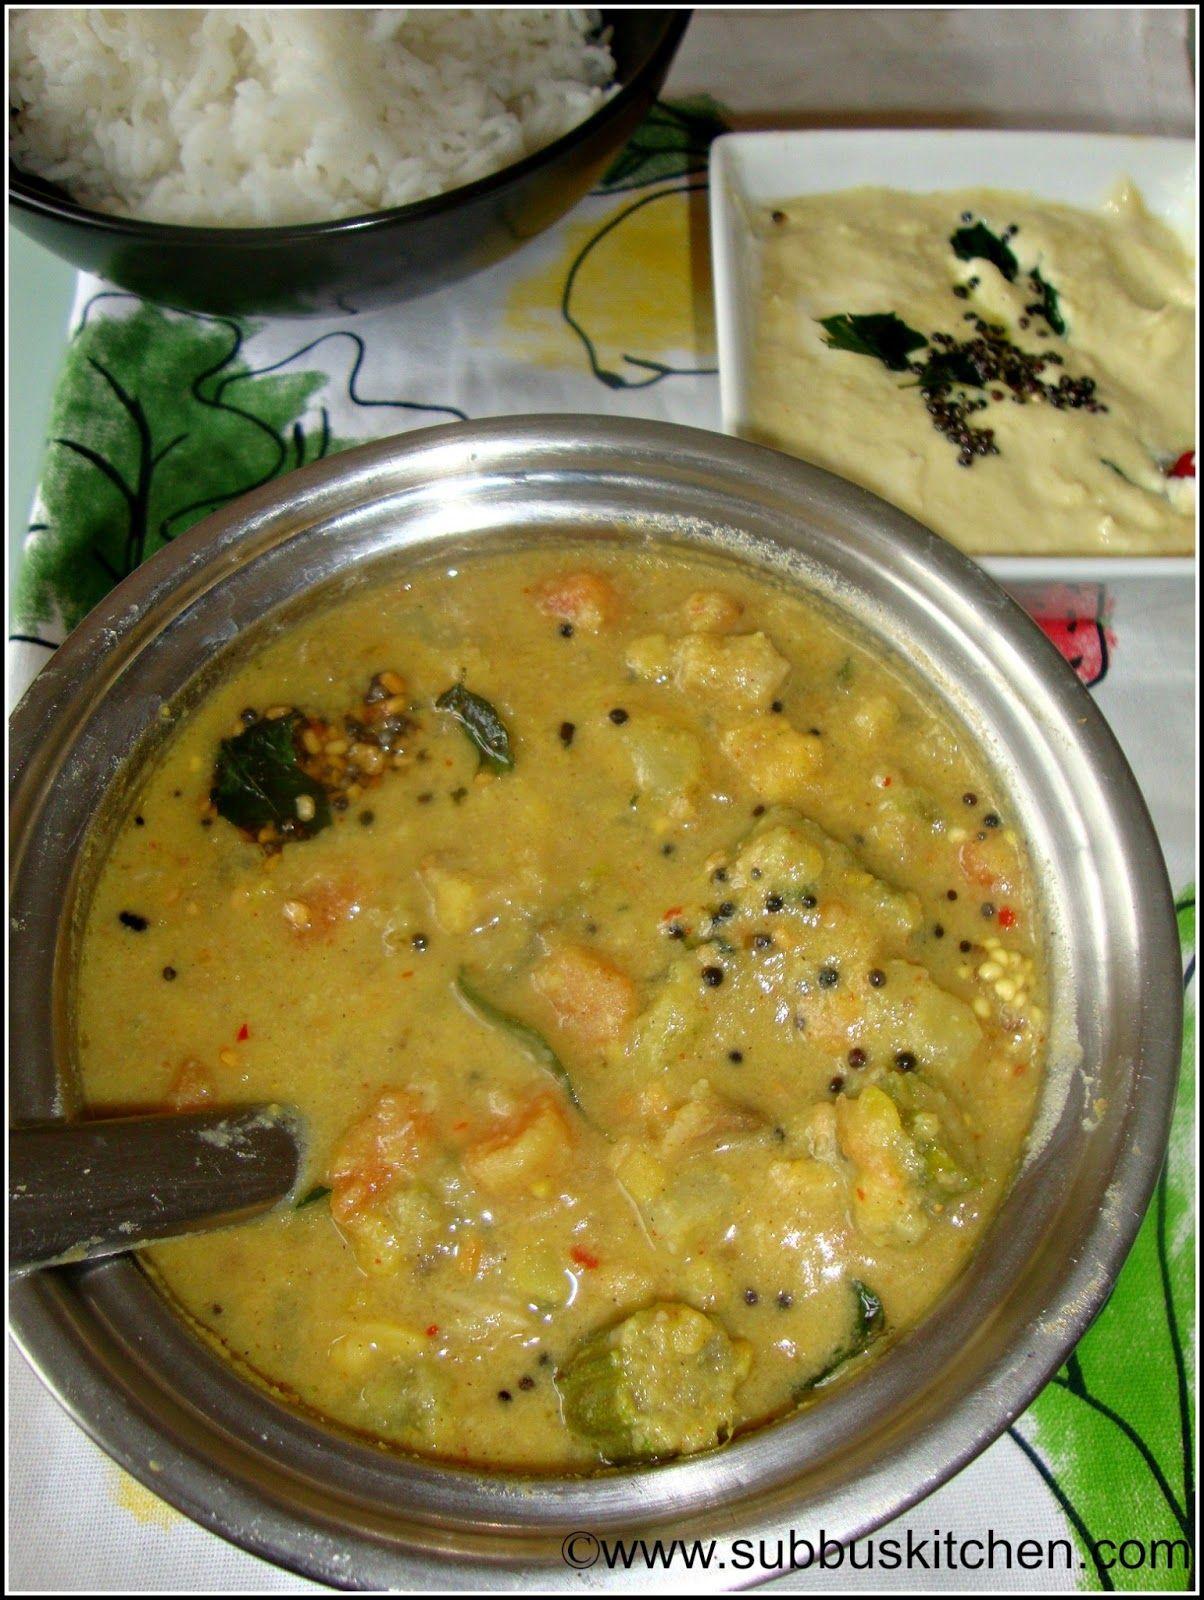 Poricha Kuzhambu Portiha Kuzhambu Indian Food Recipes Vegetarian Indian Food Recipes Vegetarian Recipes